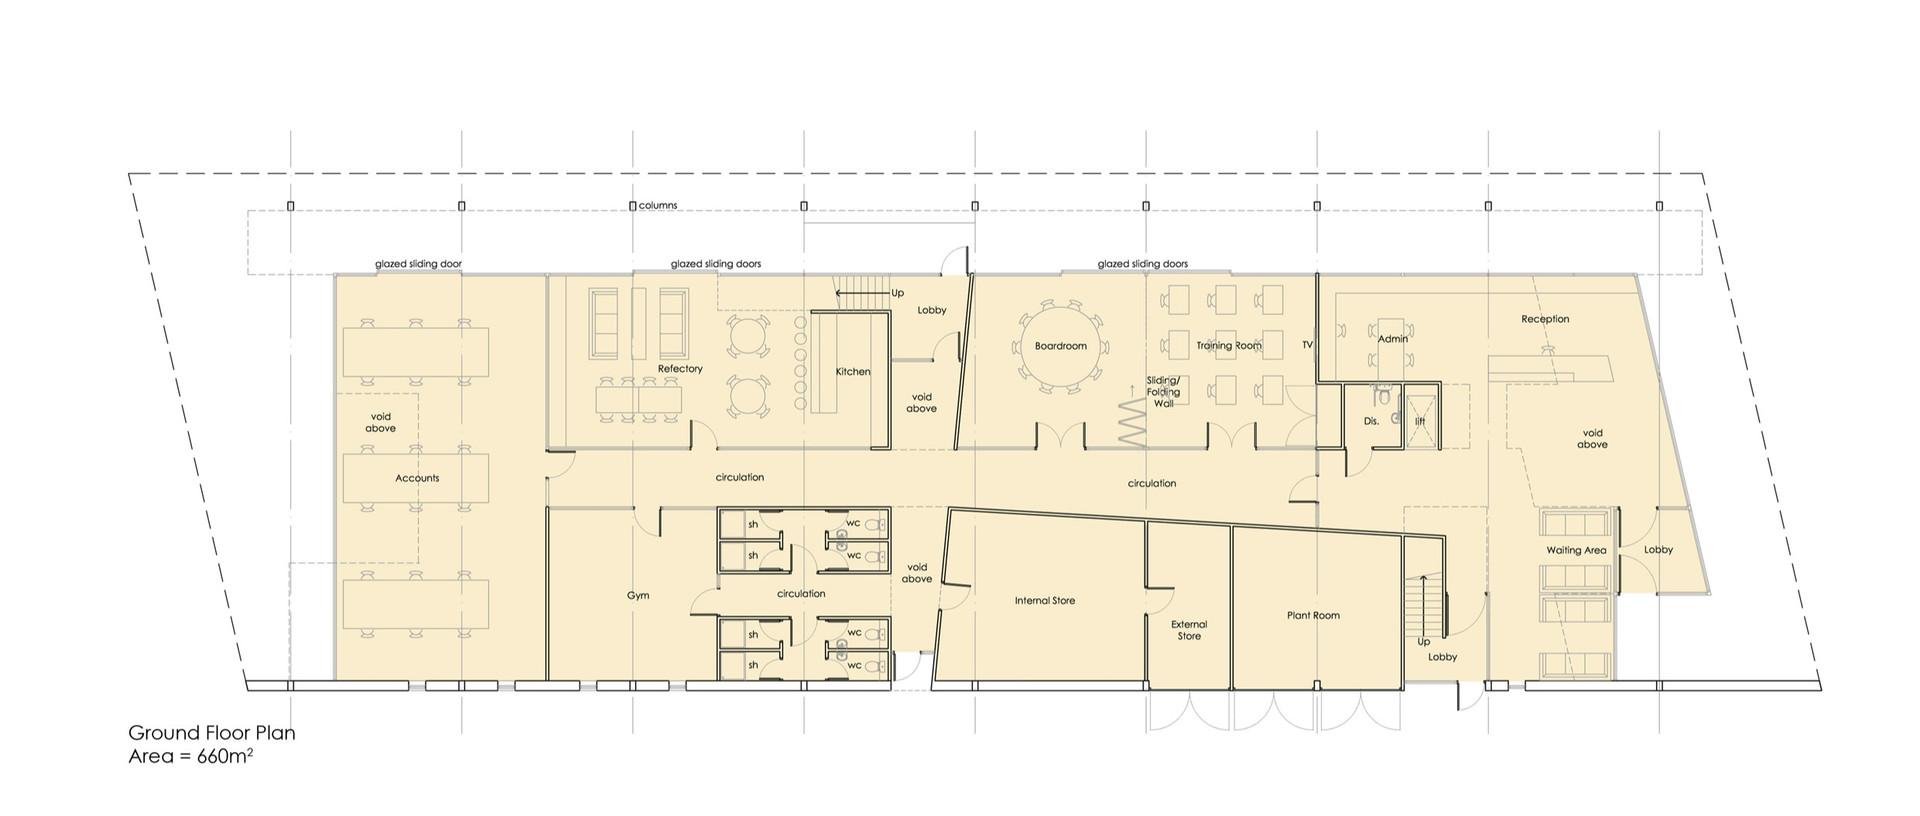 033 Ground Floor Plan & Areas_edited.jpg